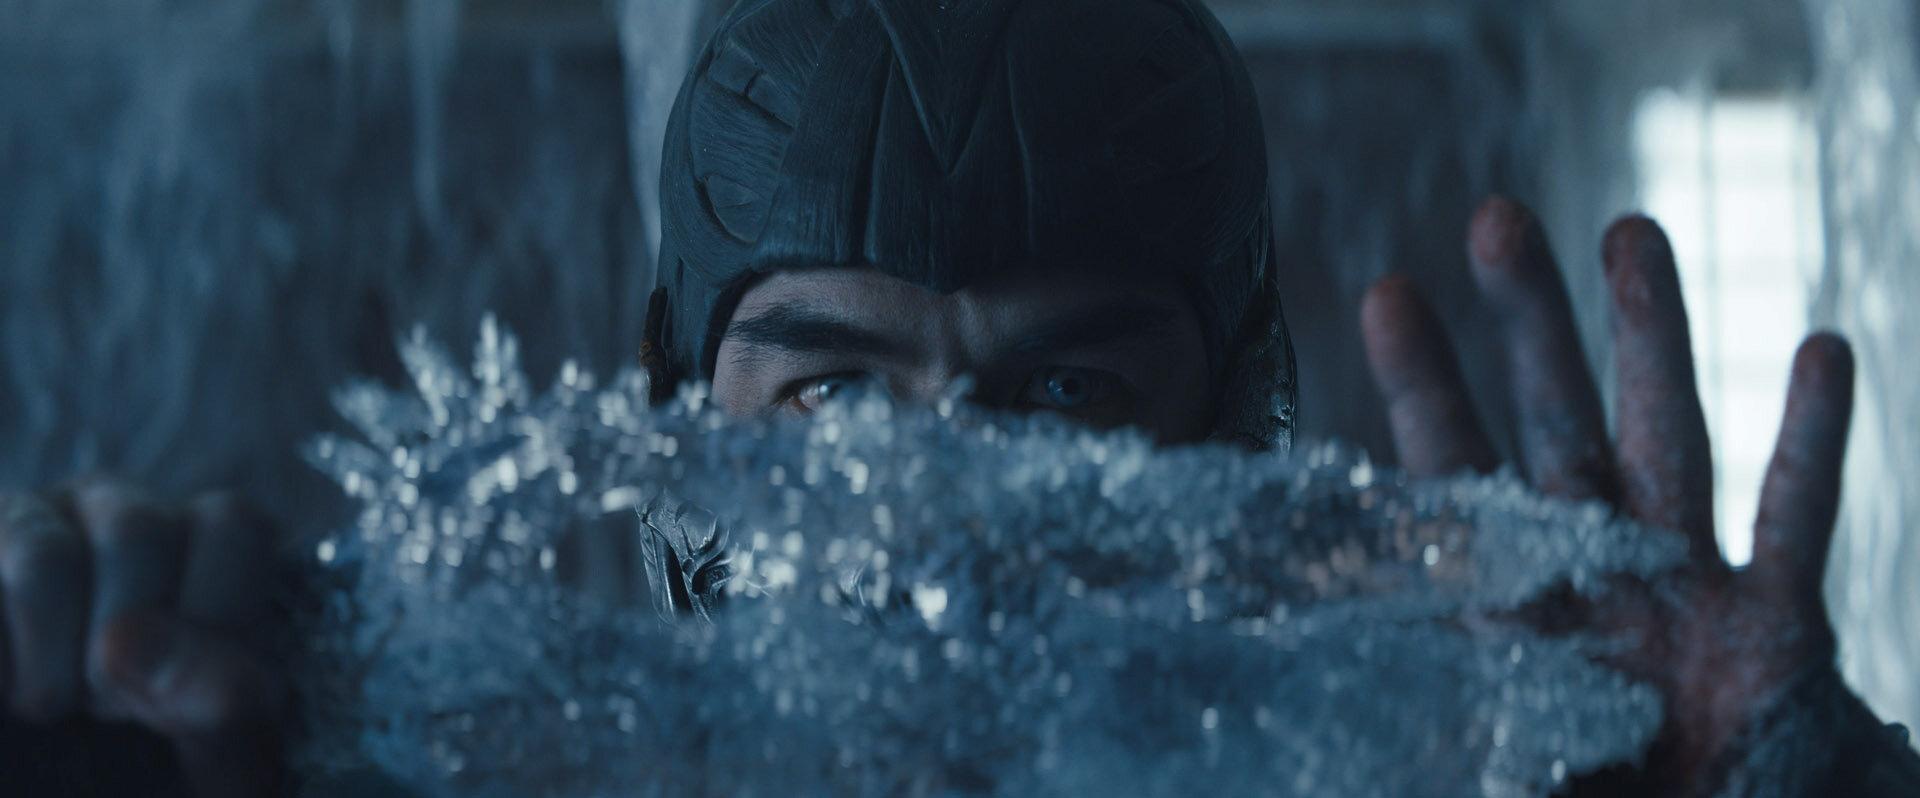 Sub-Zero in the upcoming Mortal Kombat film